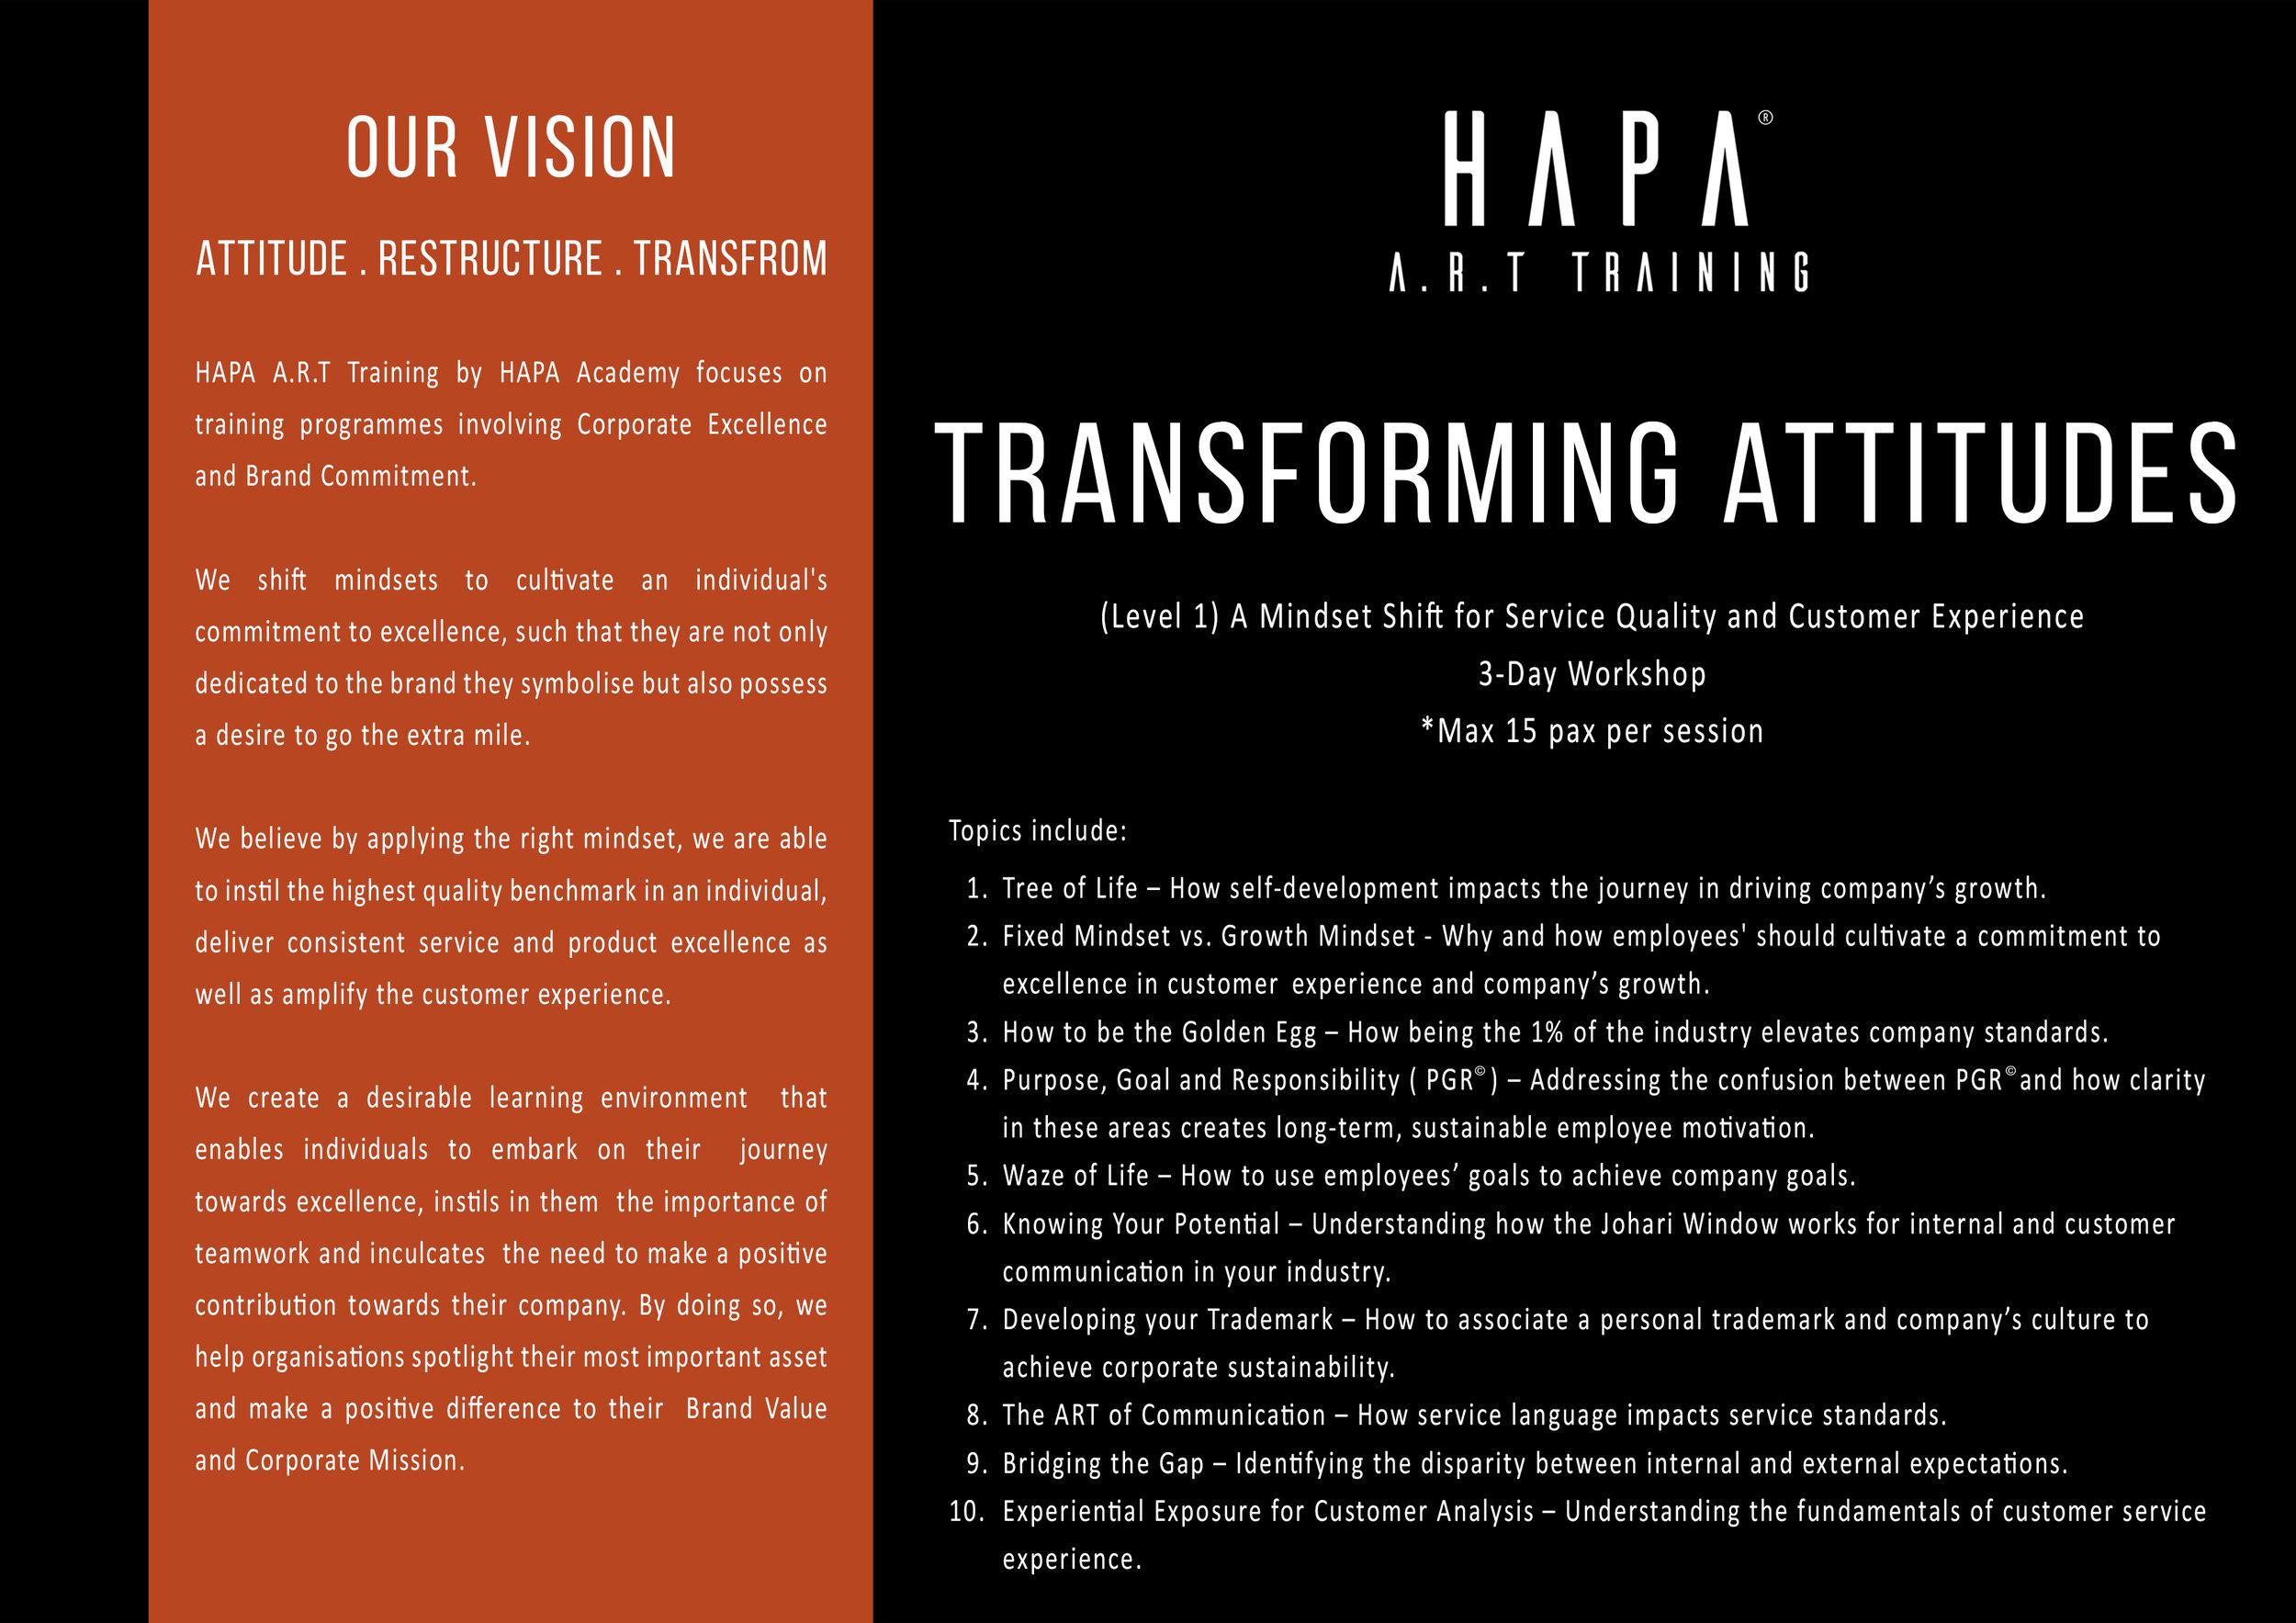 HAPA Academy - HAPA A.R.T TrainingTransofrming Attitudes.jpg